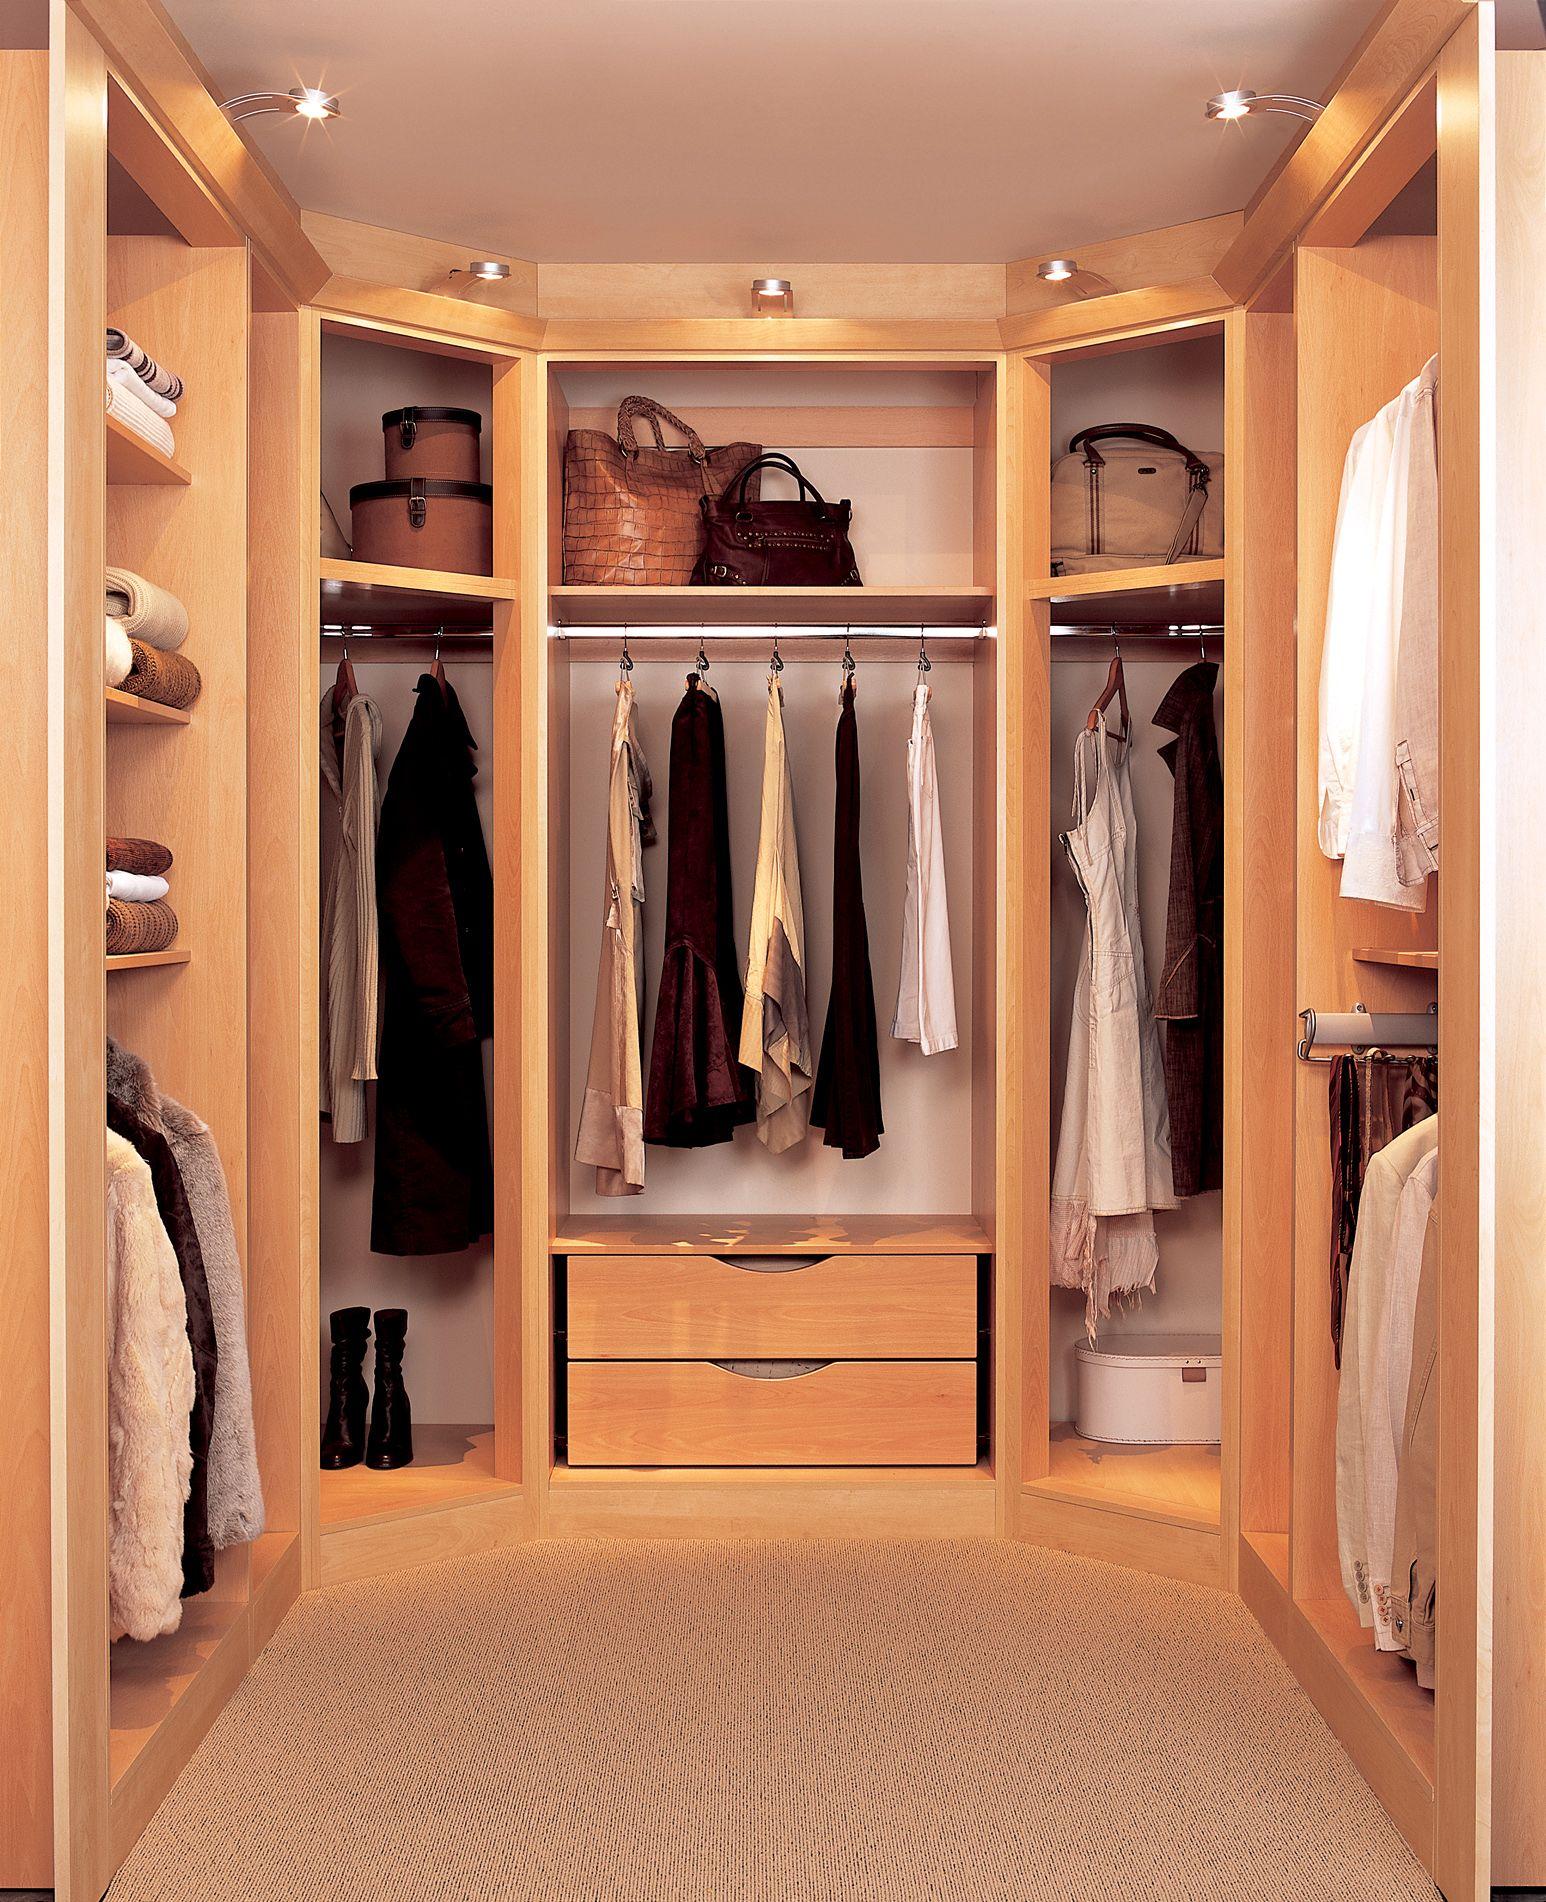 Interior Designs Walk In Closet Organizer With Nice